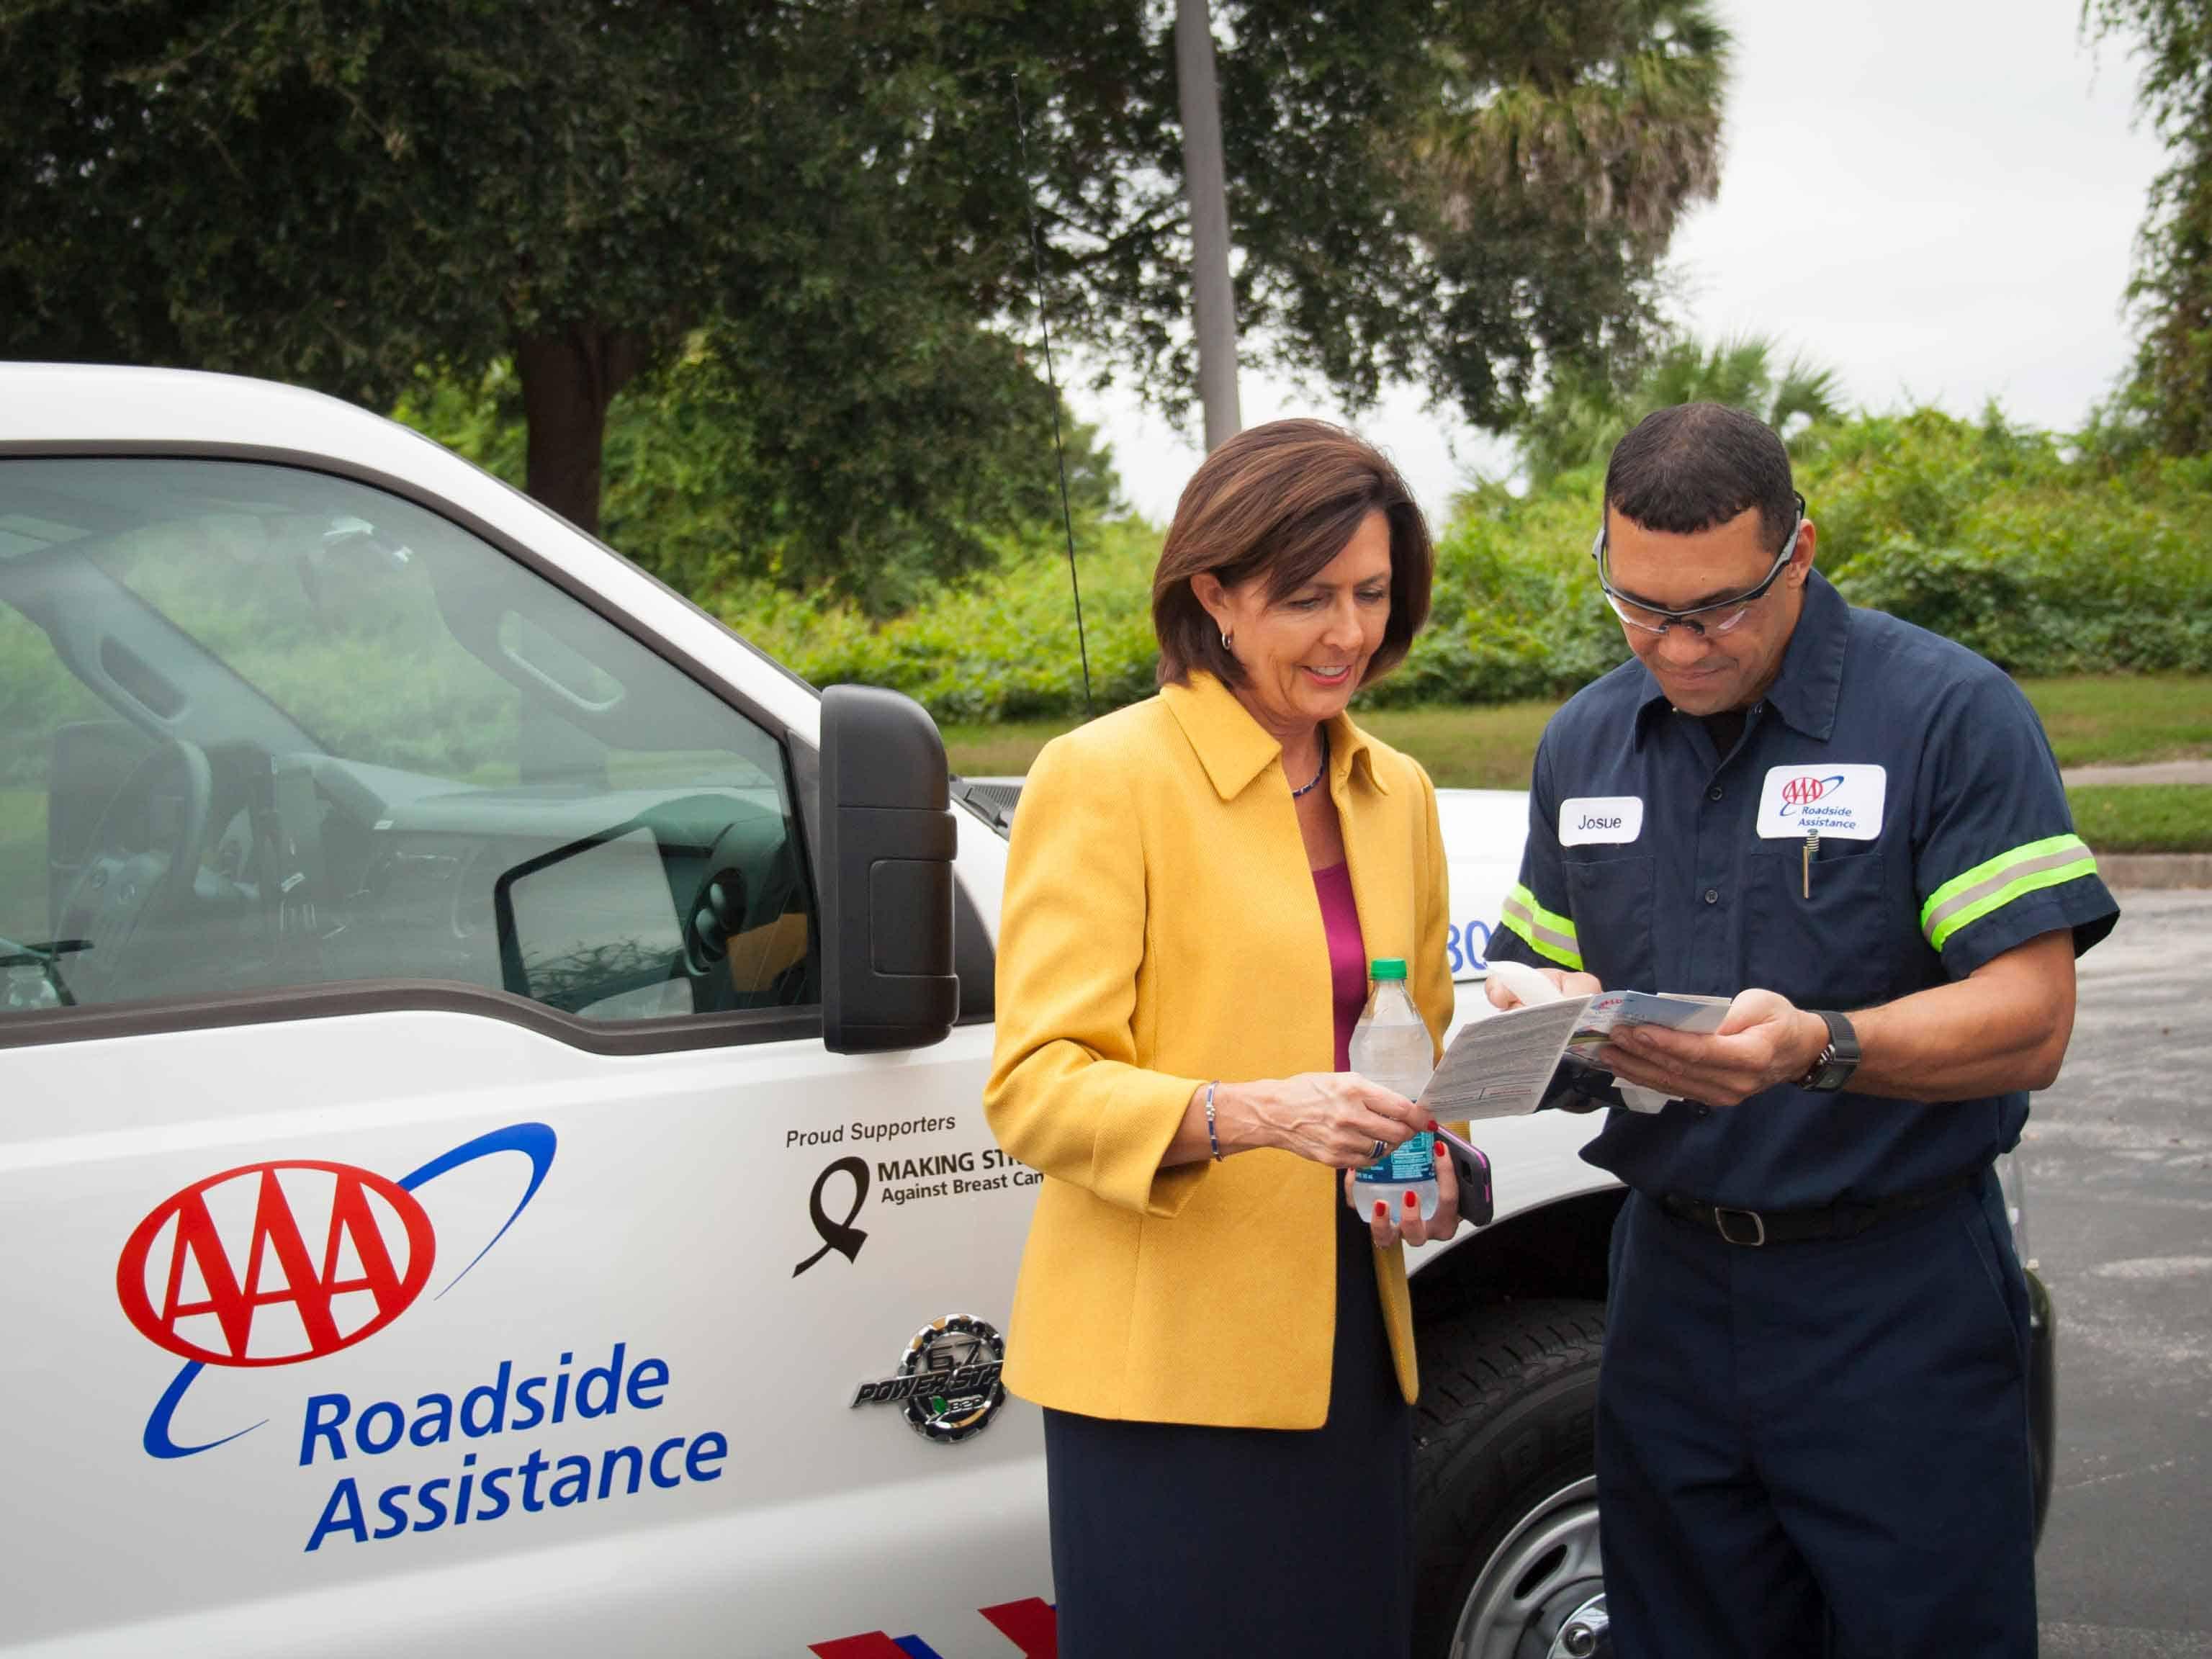 AAA American Automotive Association – roadside assistance